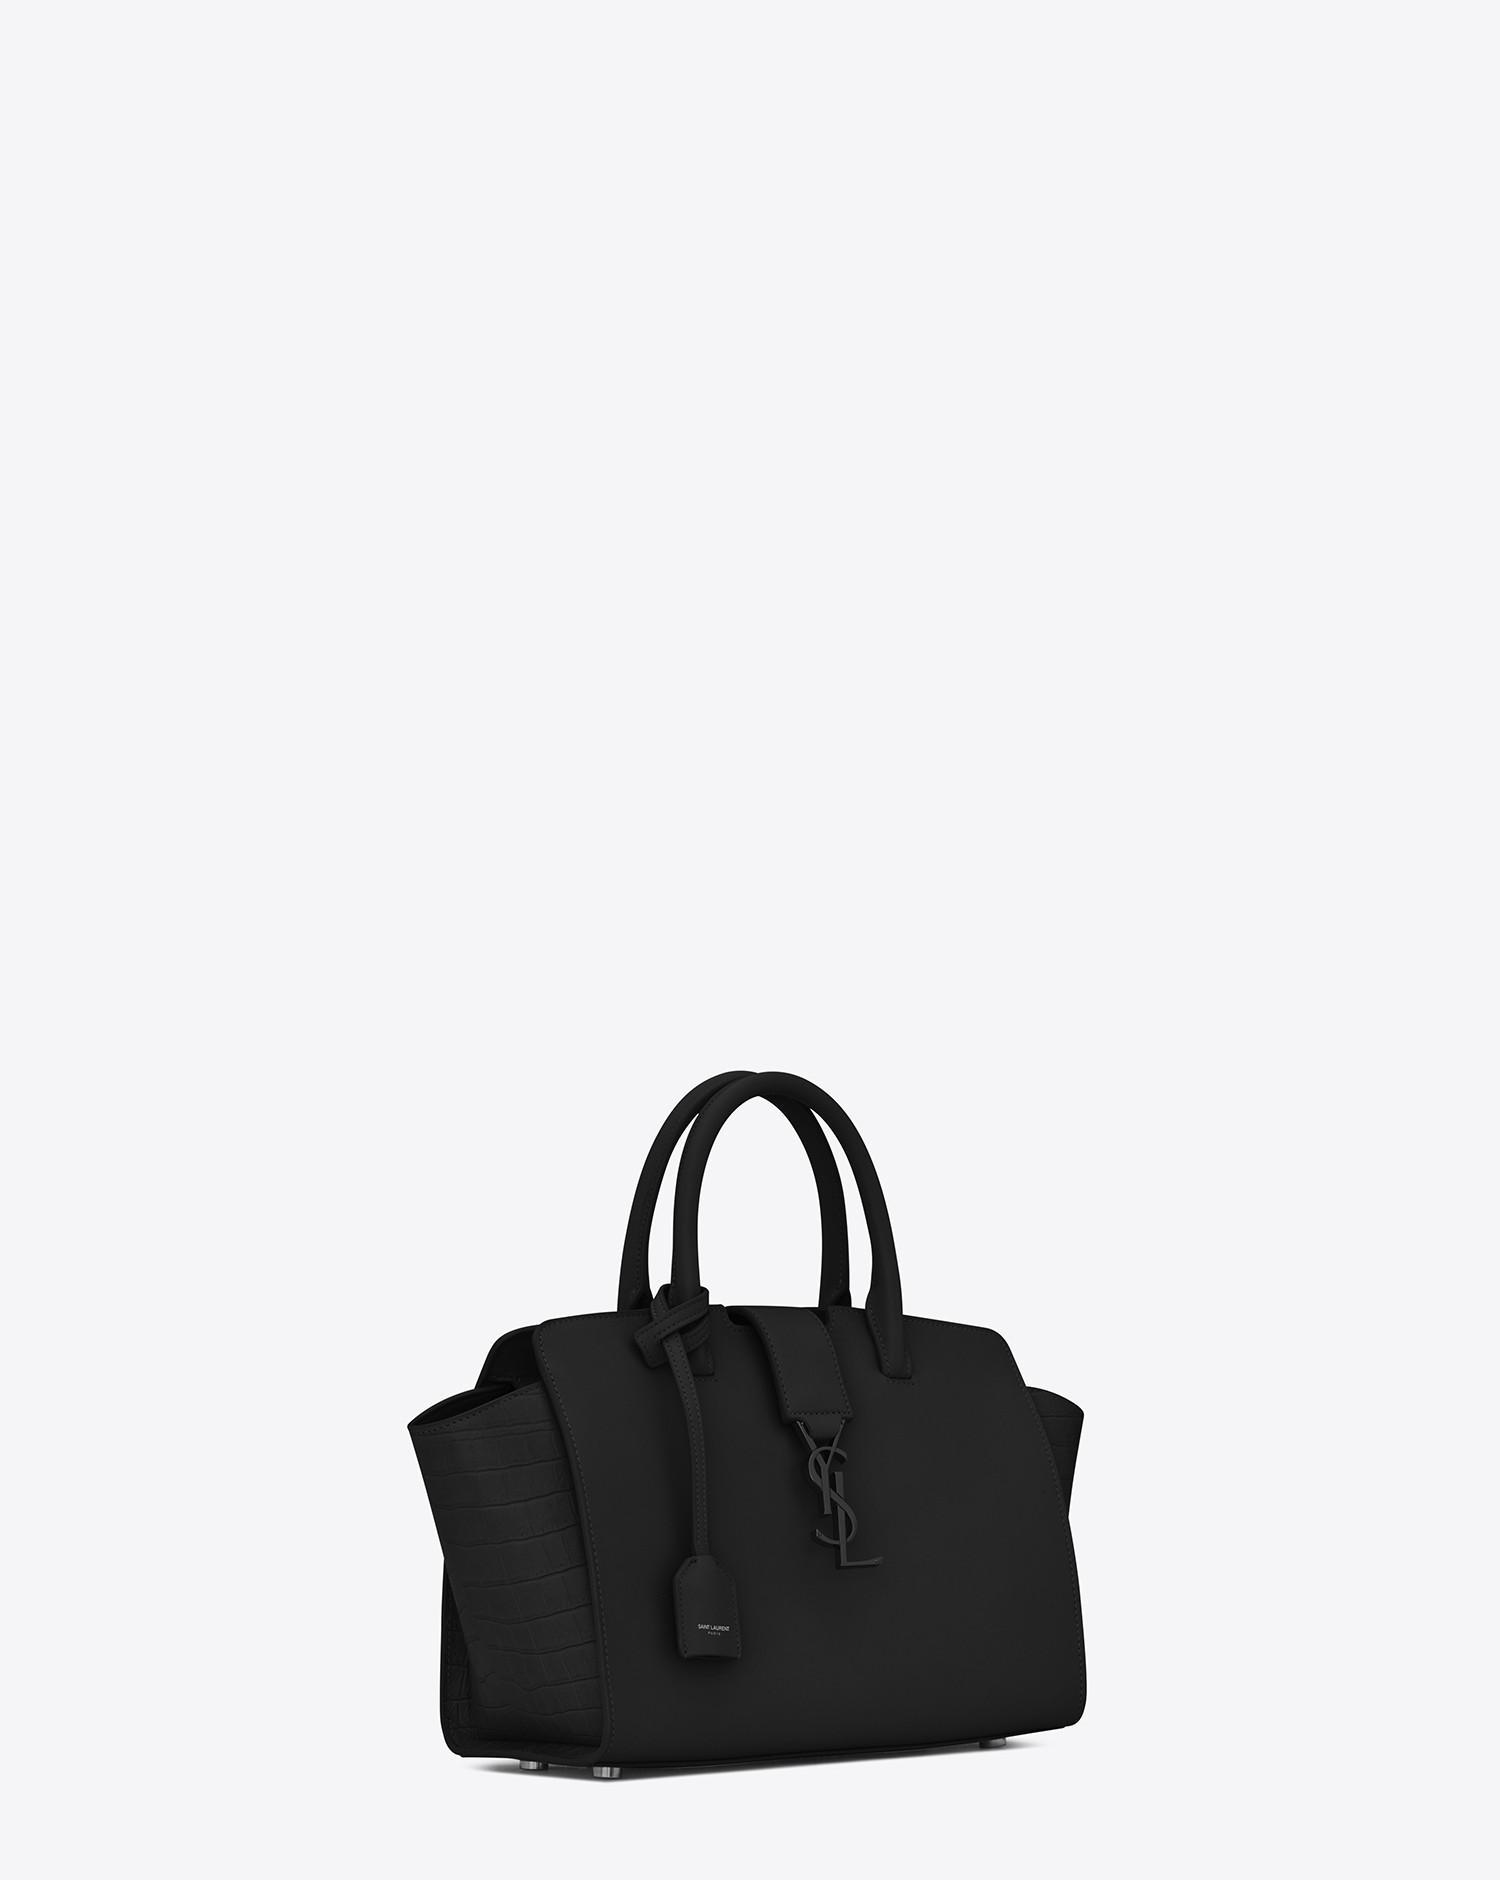 Saint Laurent. Women s Black Baby Monogram Downtown Cabas Leather Tote Bag f8a2cee5c2